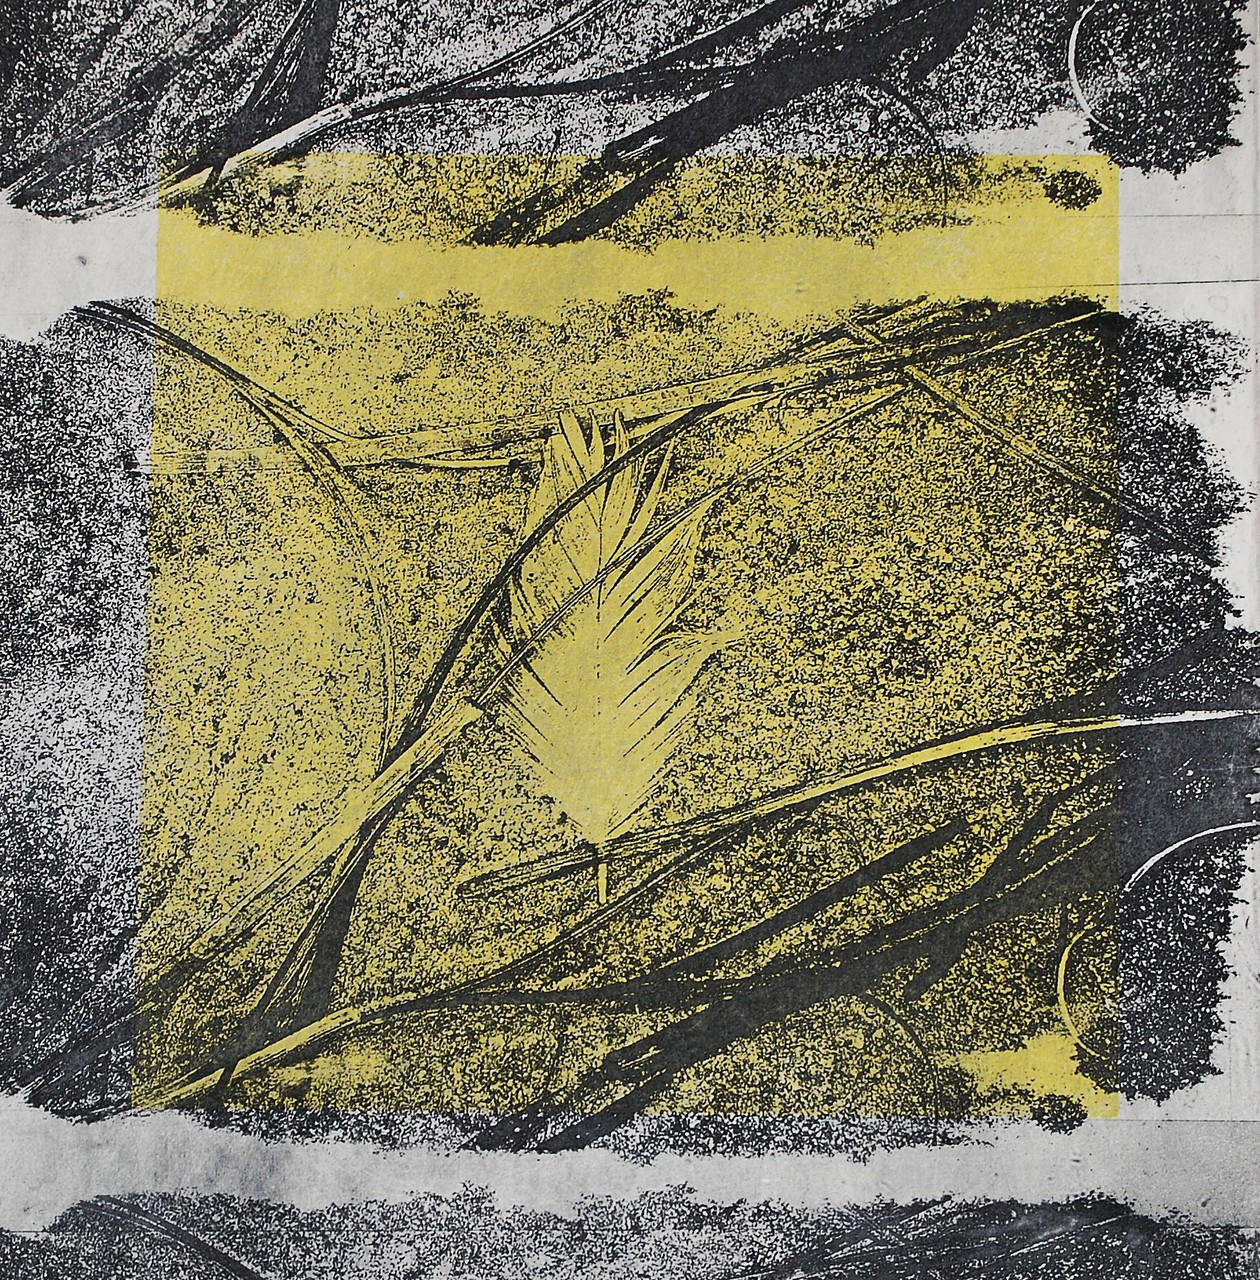 Intagliotypie, 30x30 cm, Feder am Strand